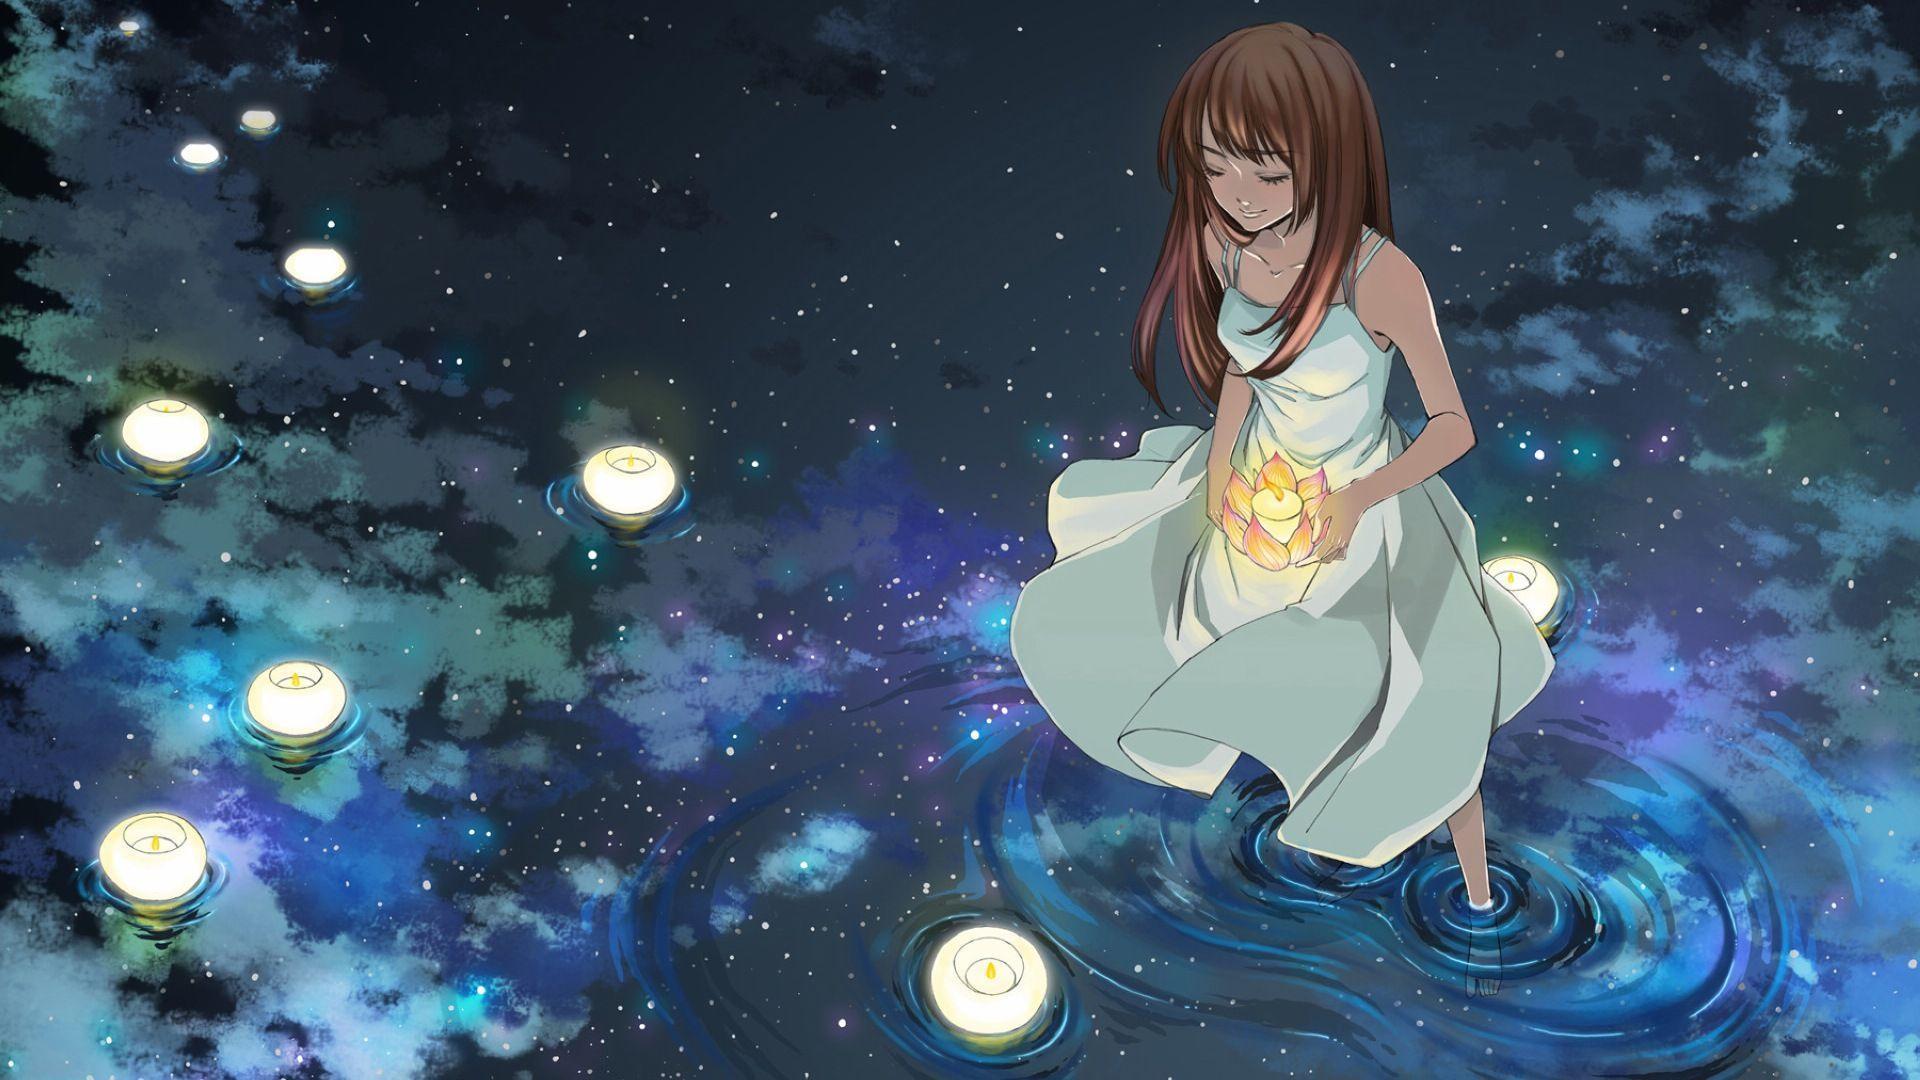 Firefly Summer Beautiful Anime Wallpaper - Beautiful Anime Wallpaper Night , HD Wallpaper & Backgrounds